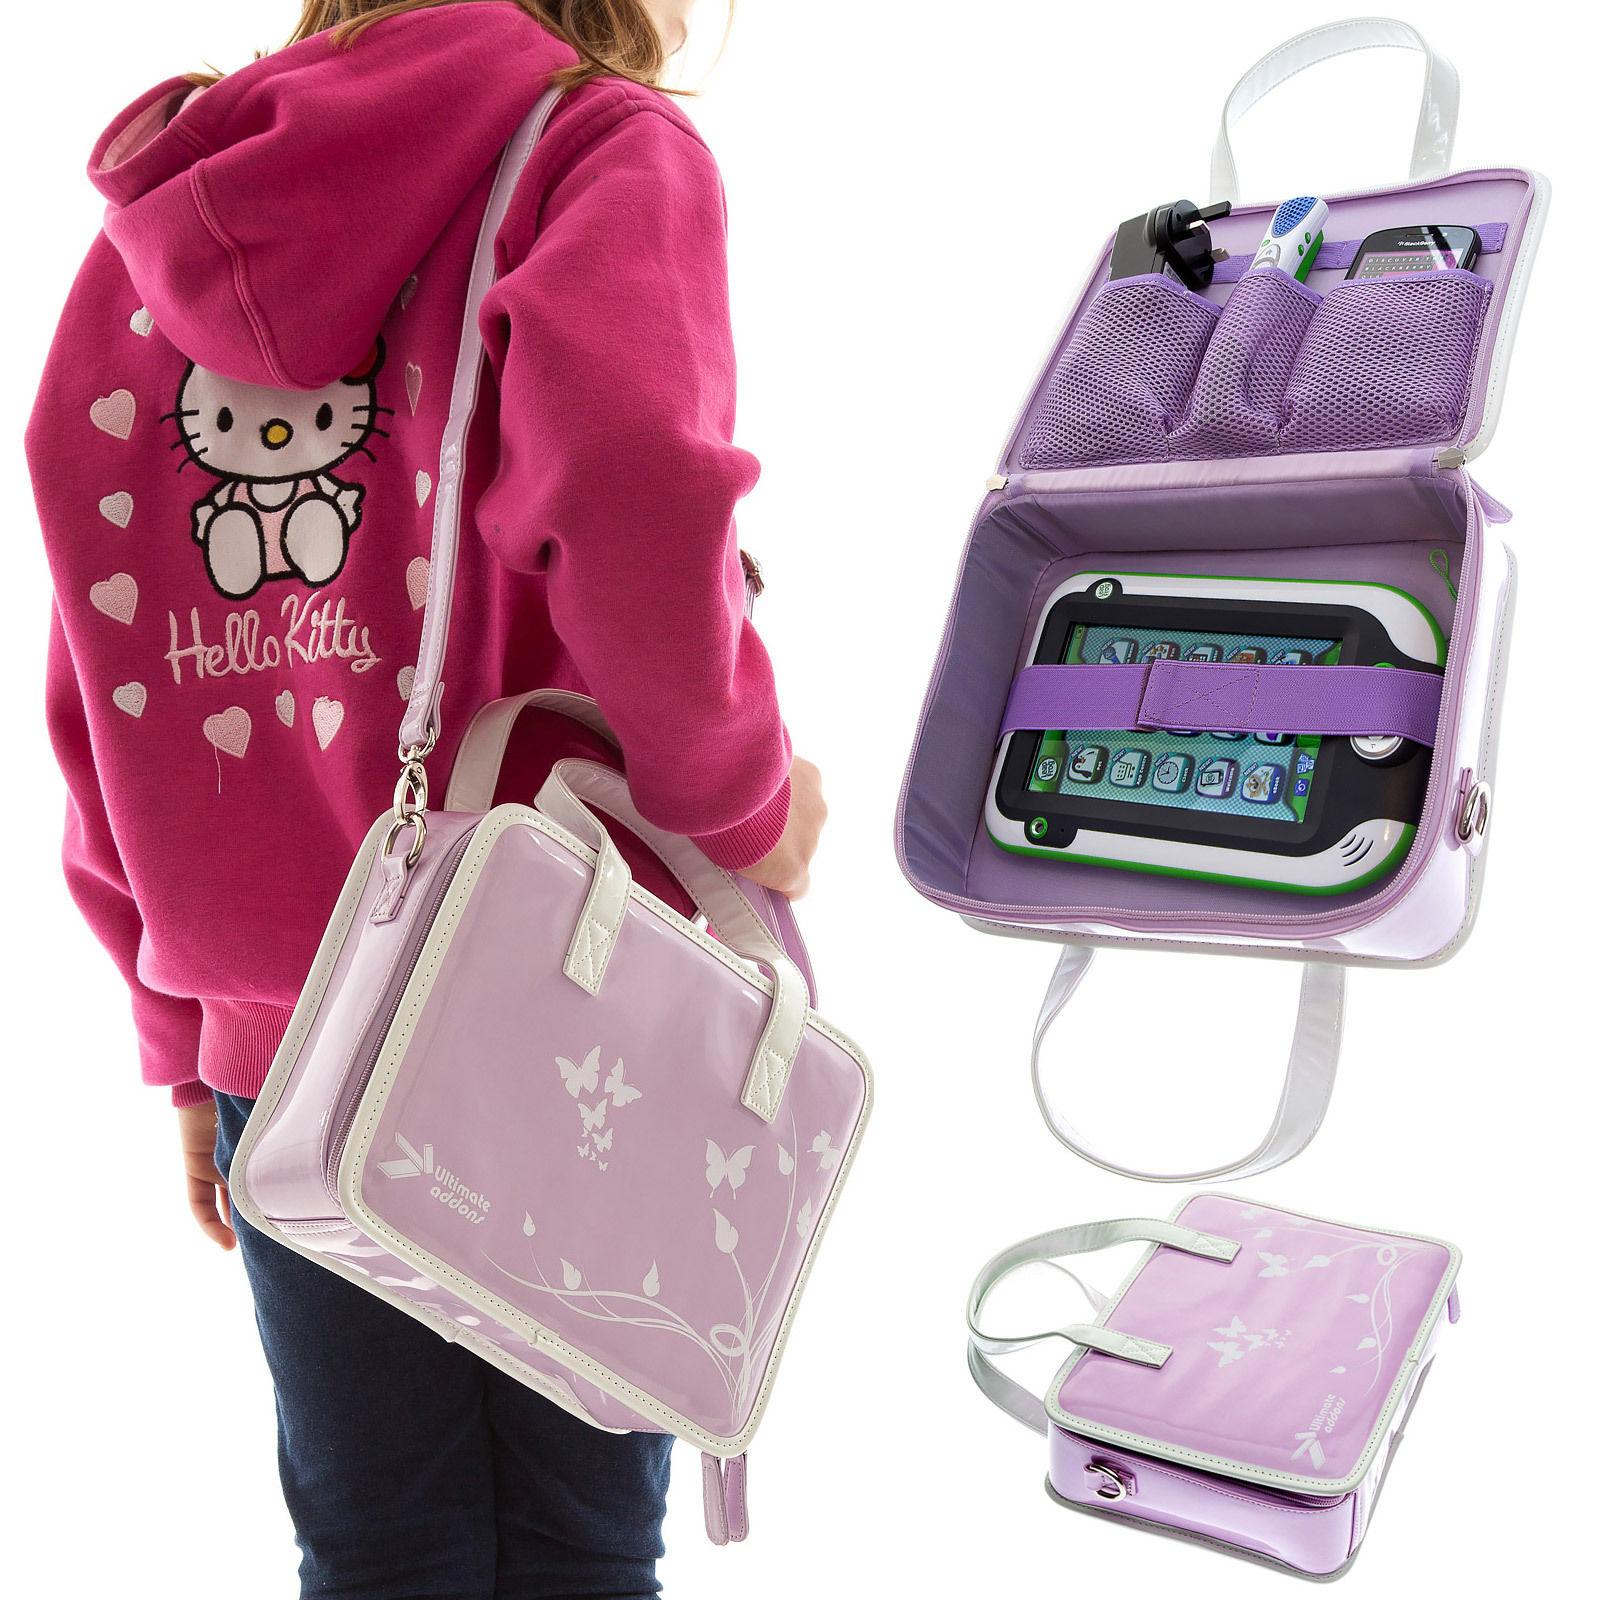 Kids Childrens Girls Handbag Storage Travel Bag Fits Apple